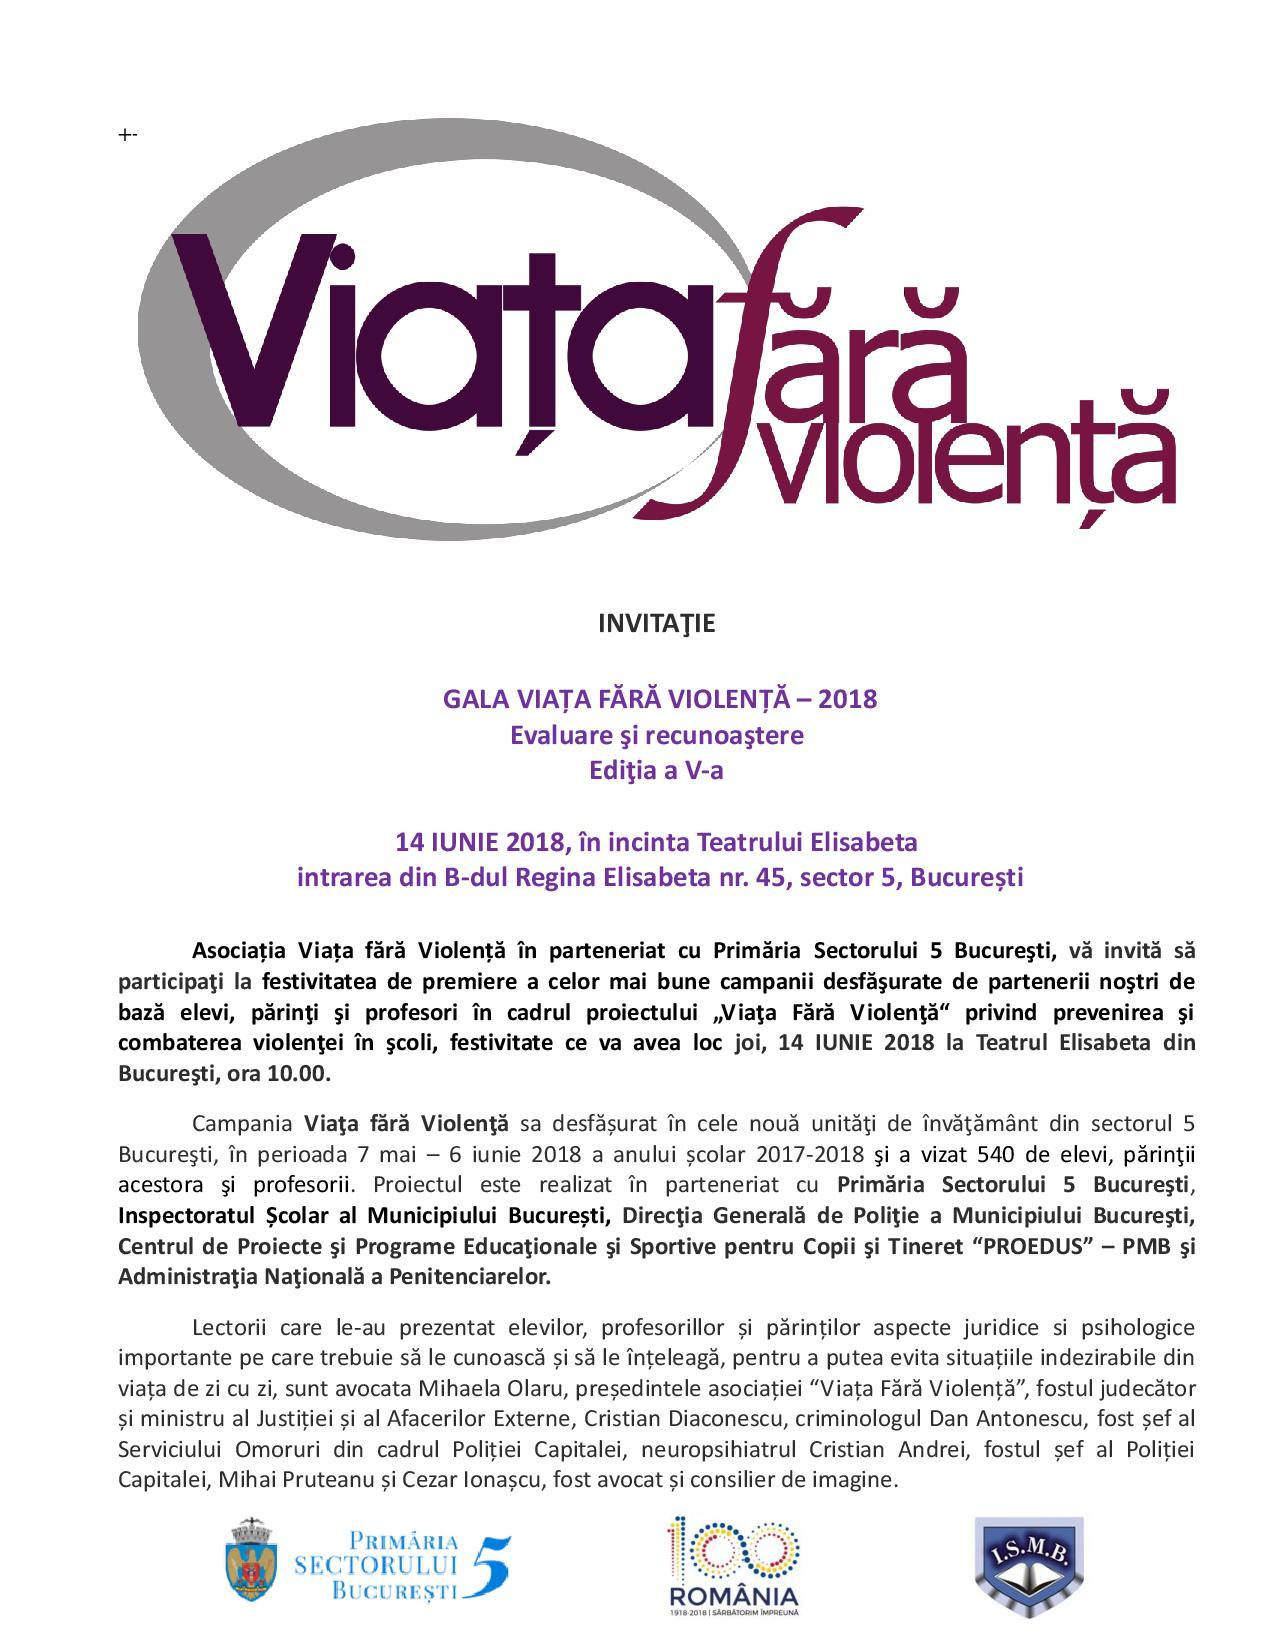 INVITATIE VIATA FARA VIOLENTA - 14 IUNIE 2018-page-001